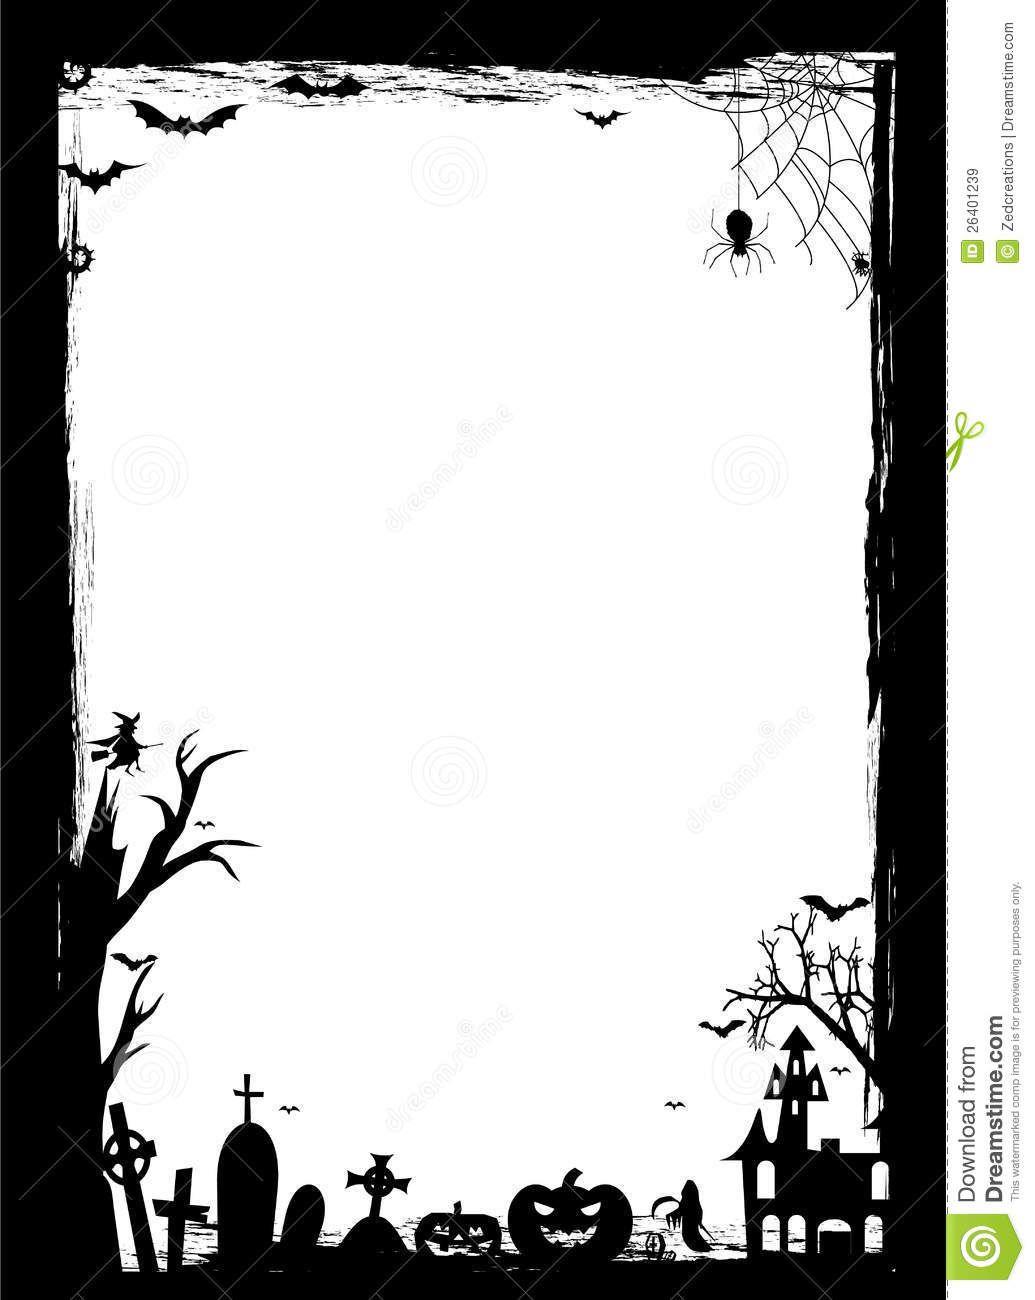 hight resolution of free graphic black and white halloween dark corners google search